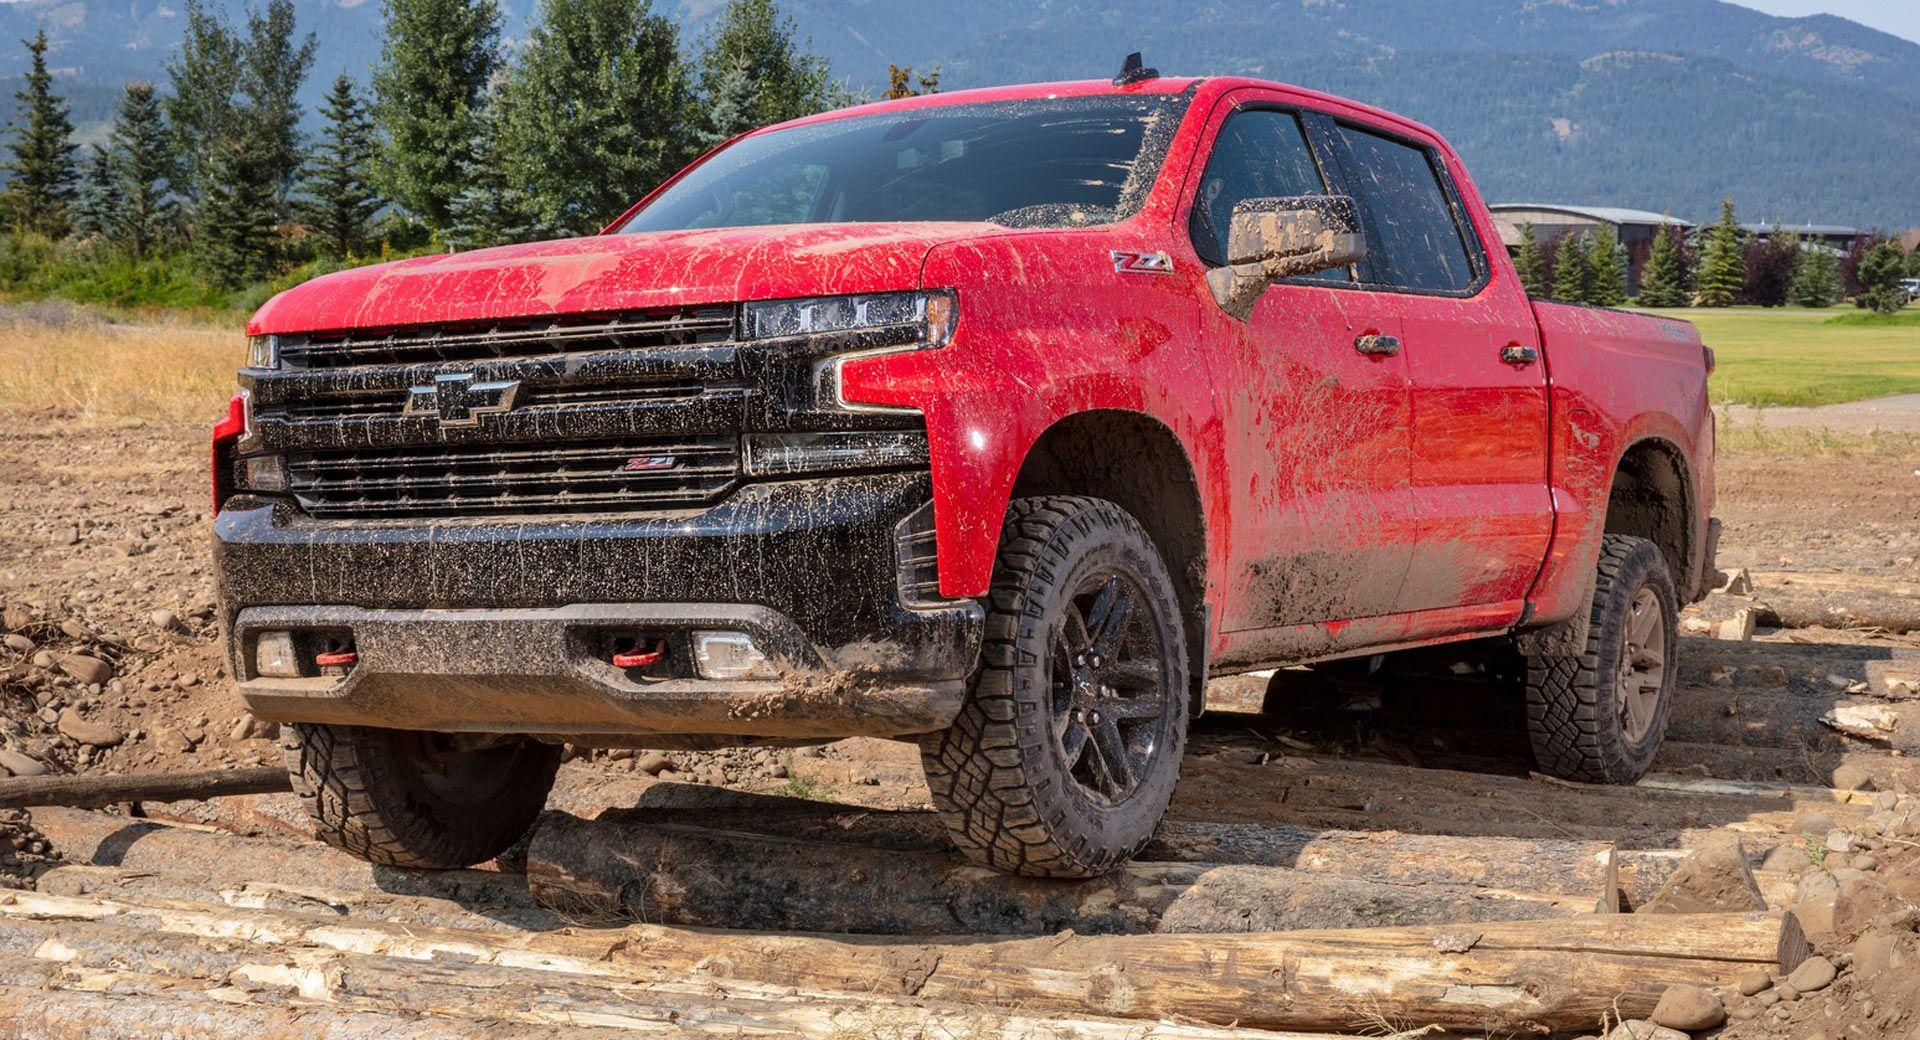 Gm Recalls More Than 900 000 Vehicles Worldwide Over Software And Fire Risk Issues Chevrolet Silverado Silverado Chevy Silverado